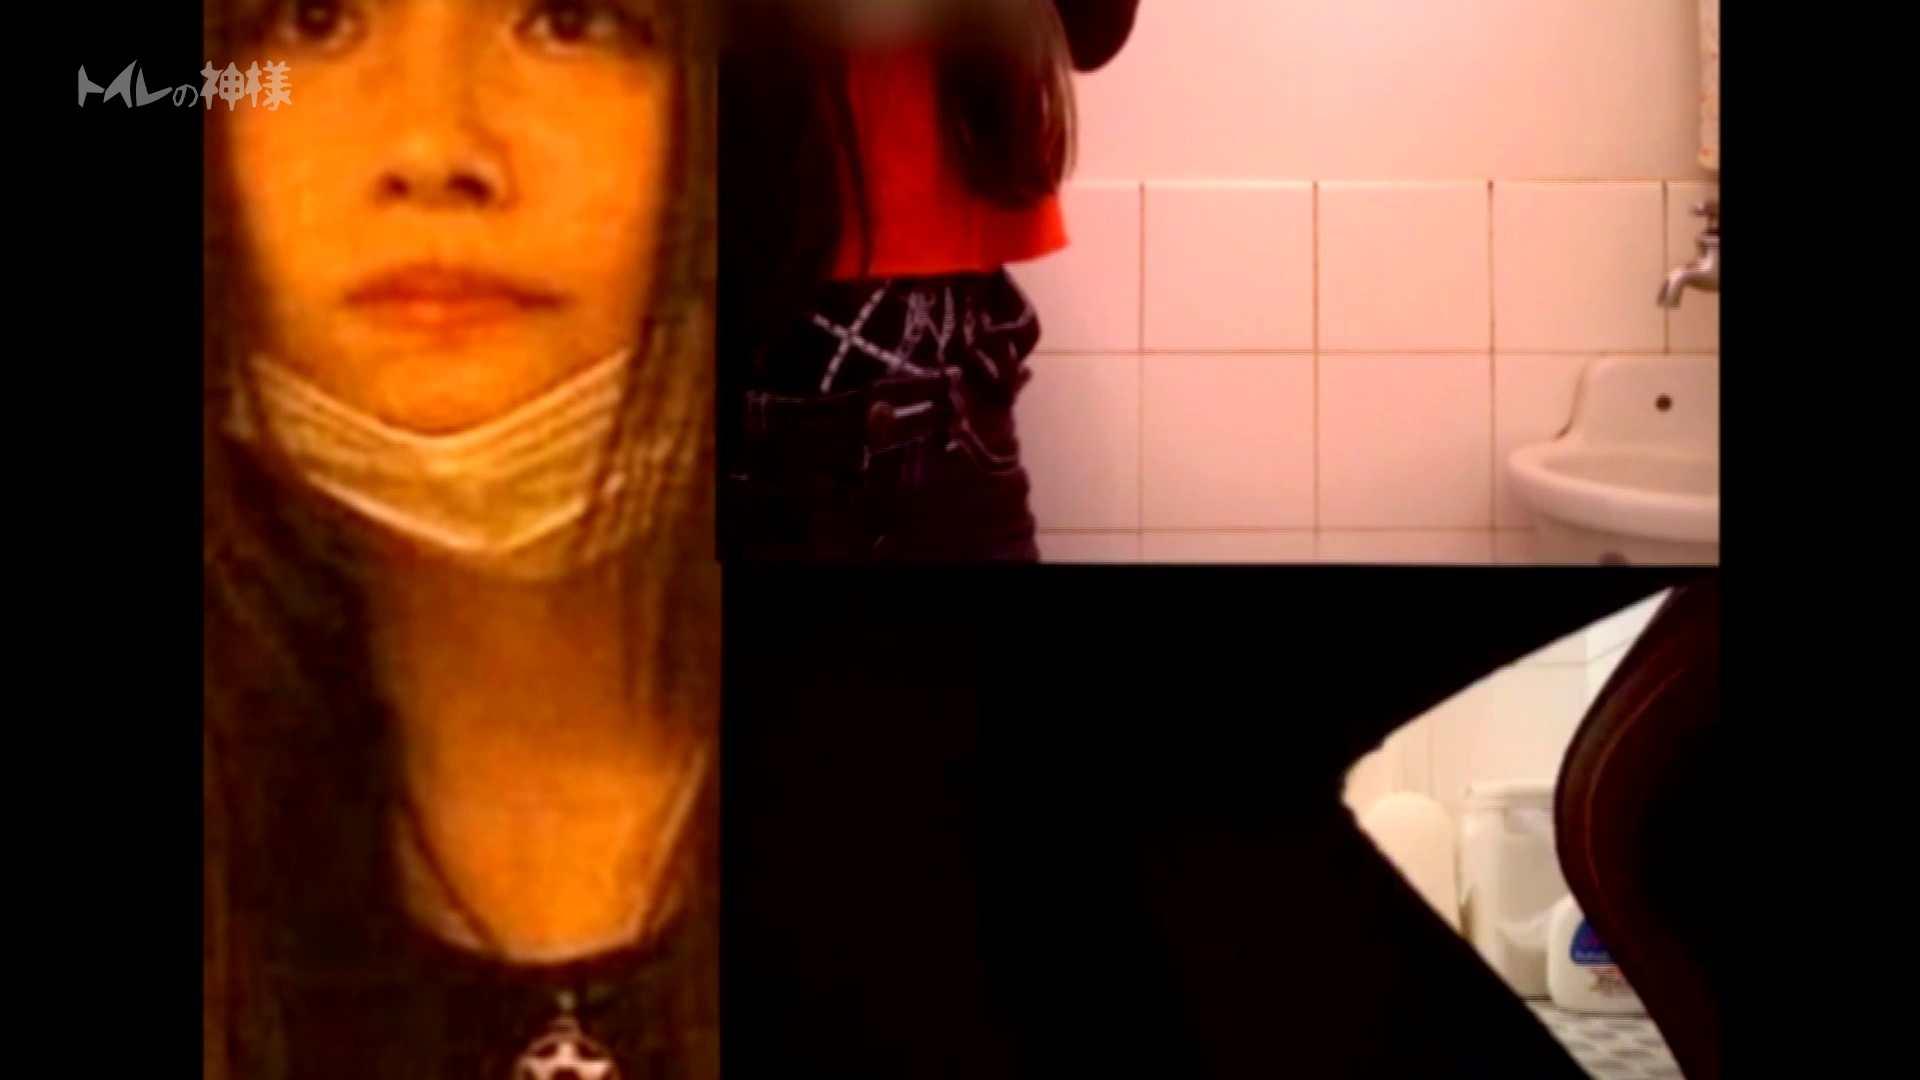 Vol.02 花の女子大生うんこ盗撮2 トイレ盗撮 AV無料動画キャプチャ 92枚 86